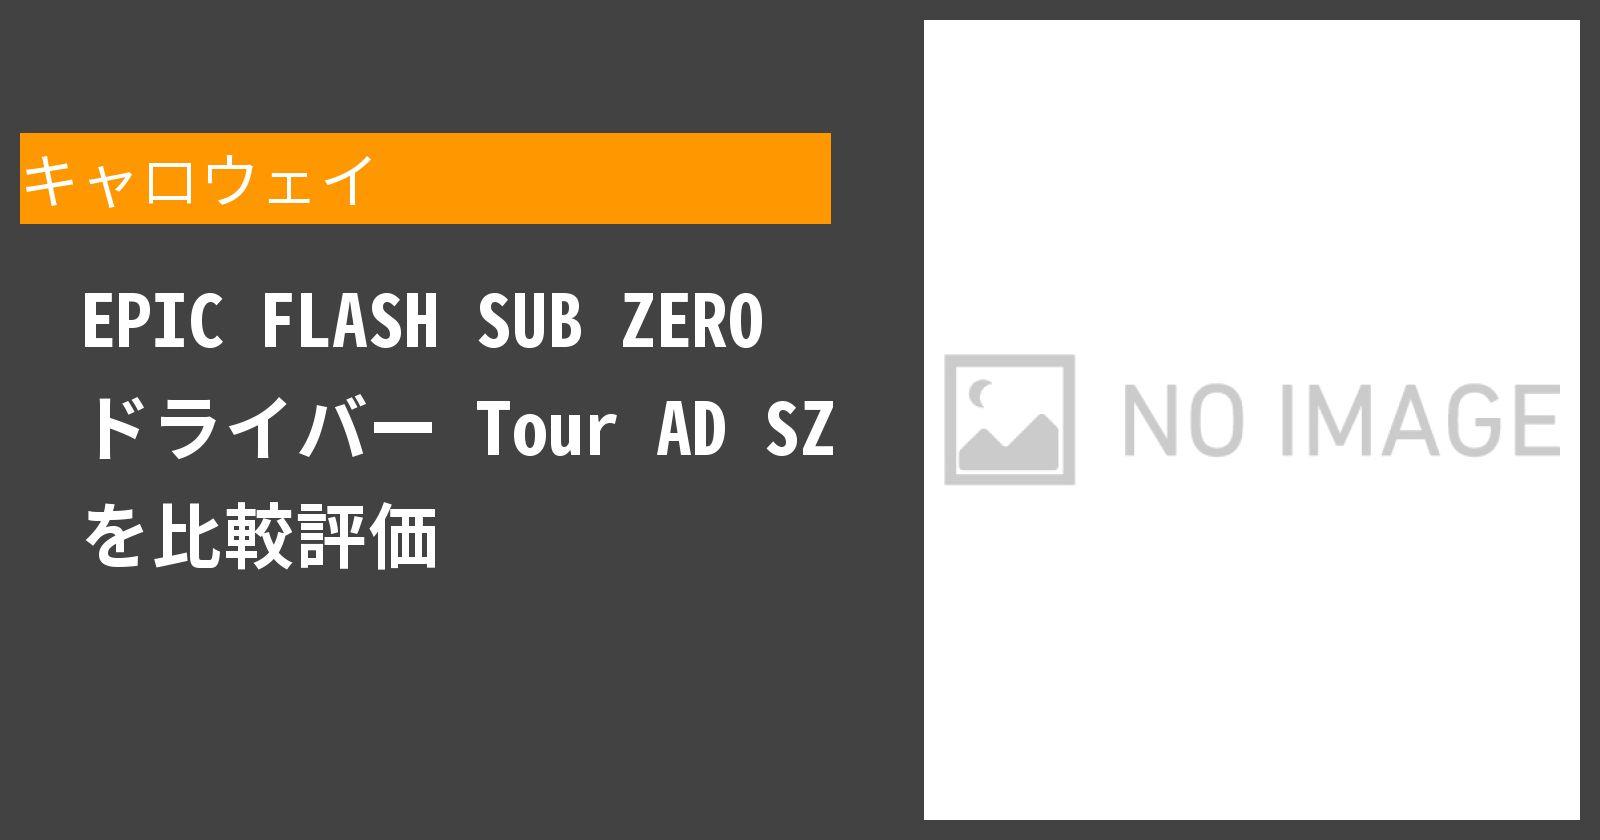 EPIC FLASH SUB ZERO ドライバー Tour AD SZを徹底評価